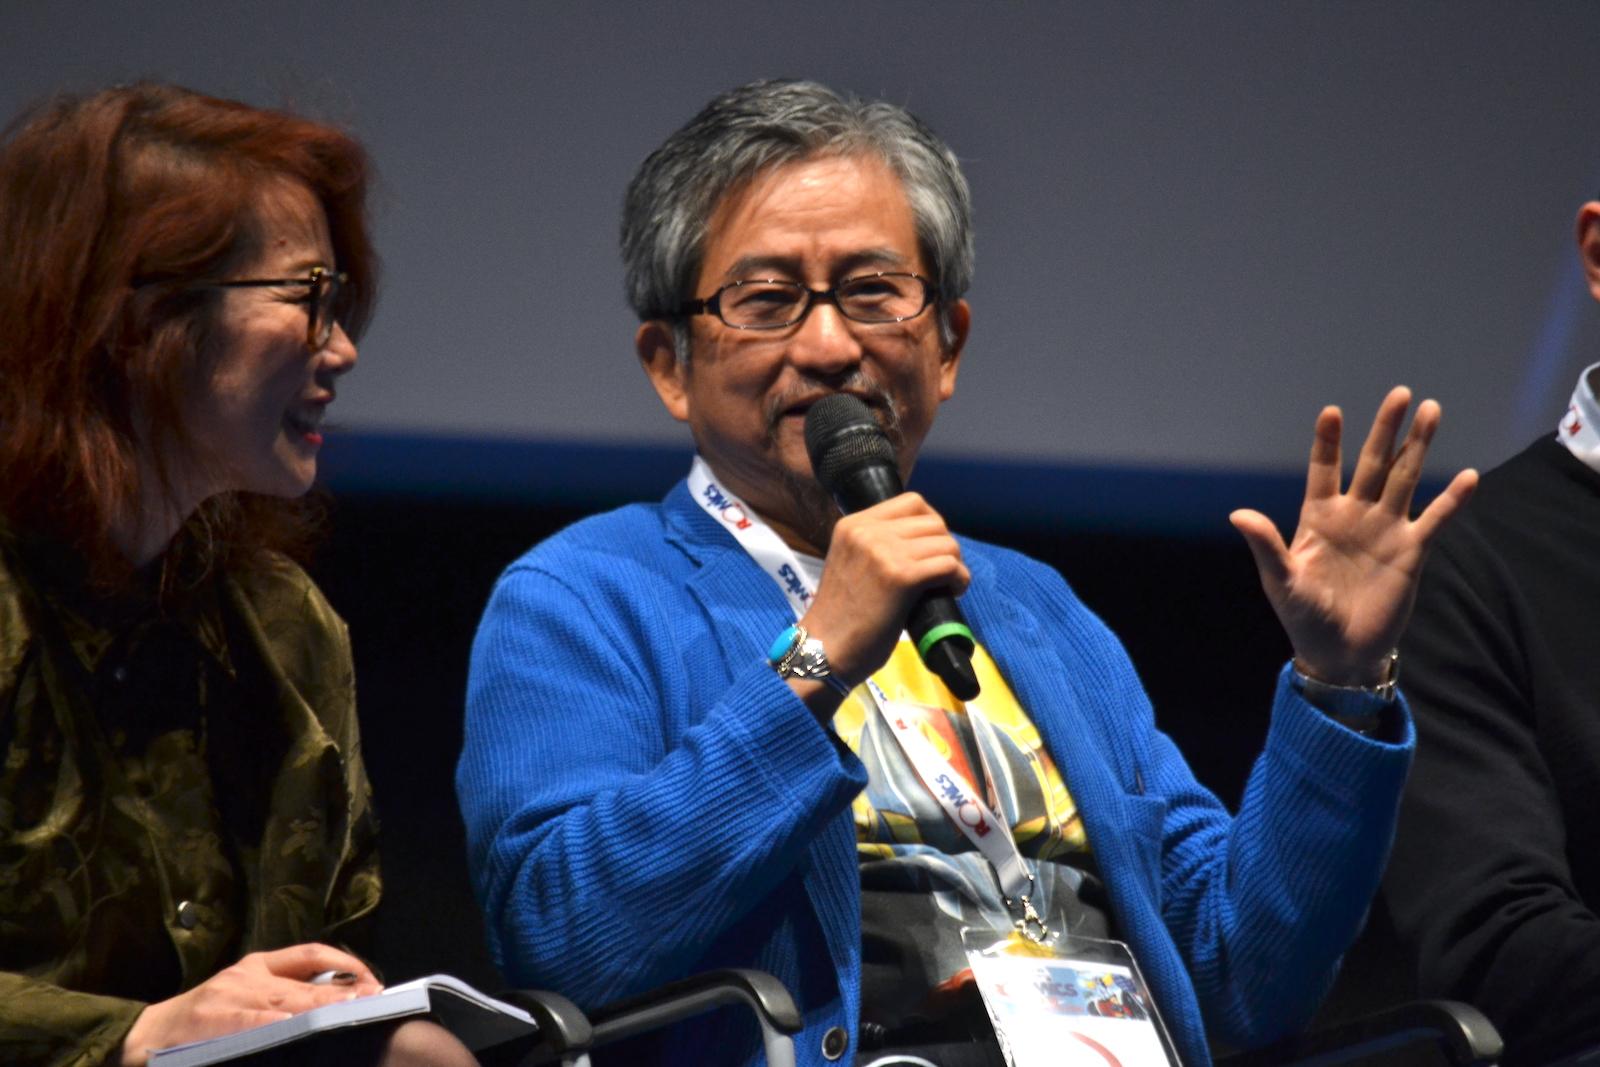 Romics 2016: Go Nagai parla all'incontro a lui dedicato